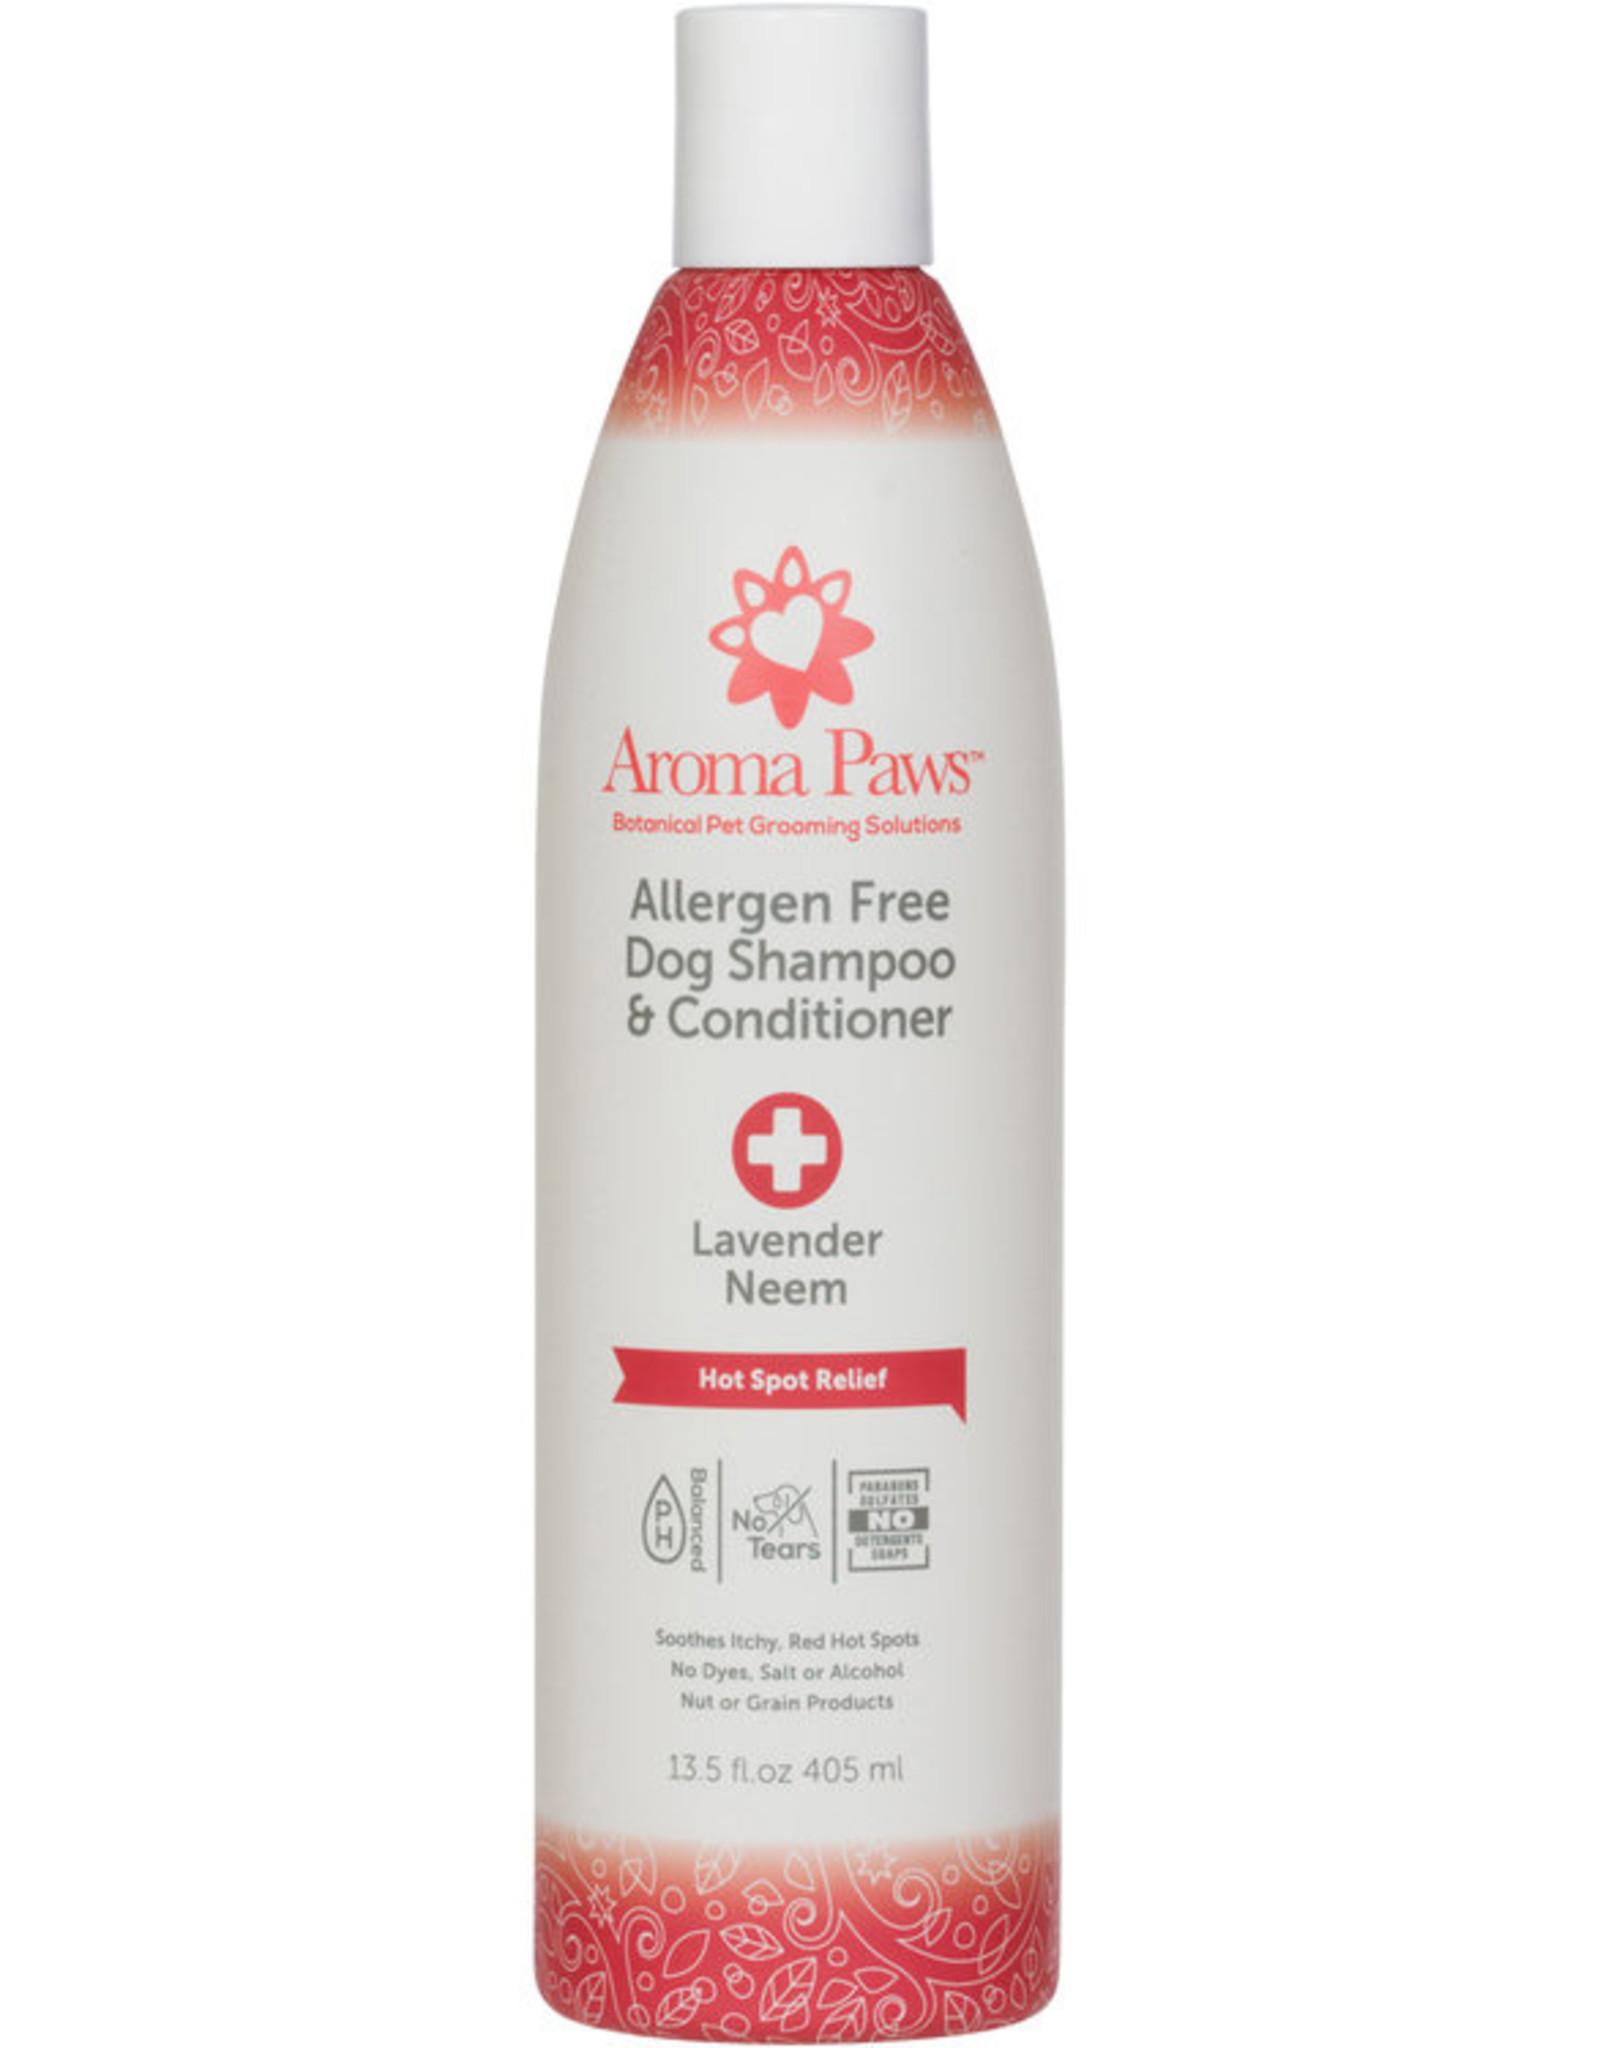 Allergen Free Hot Spot Relief Dog Shampoo- Hot Spot Relief Formula 13.5 Oz